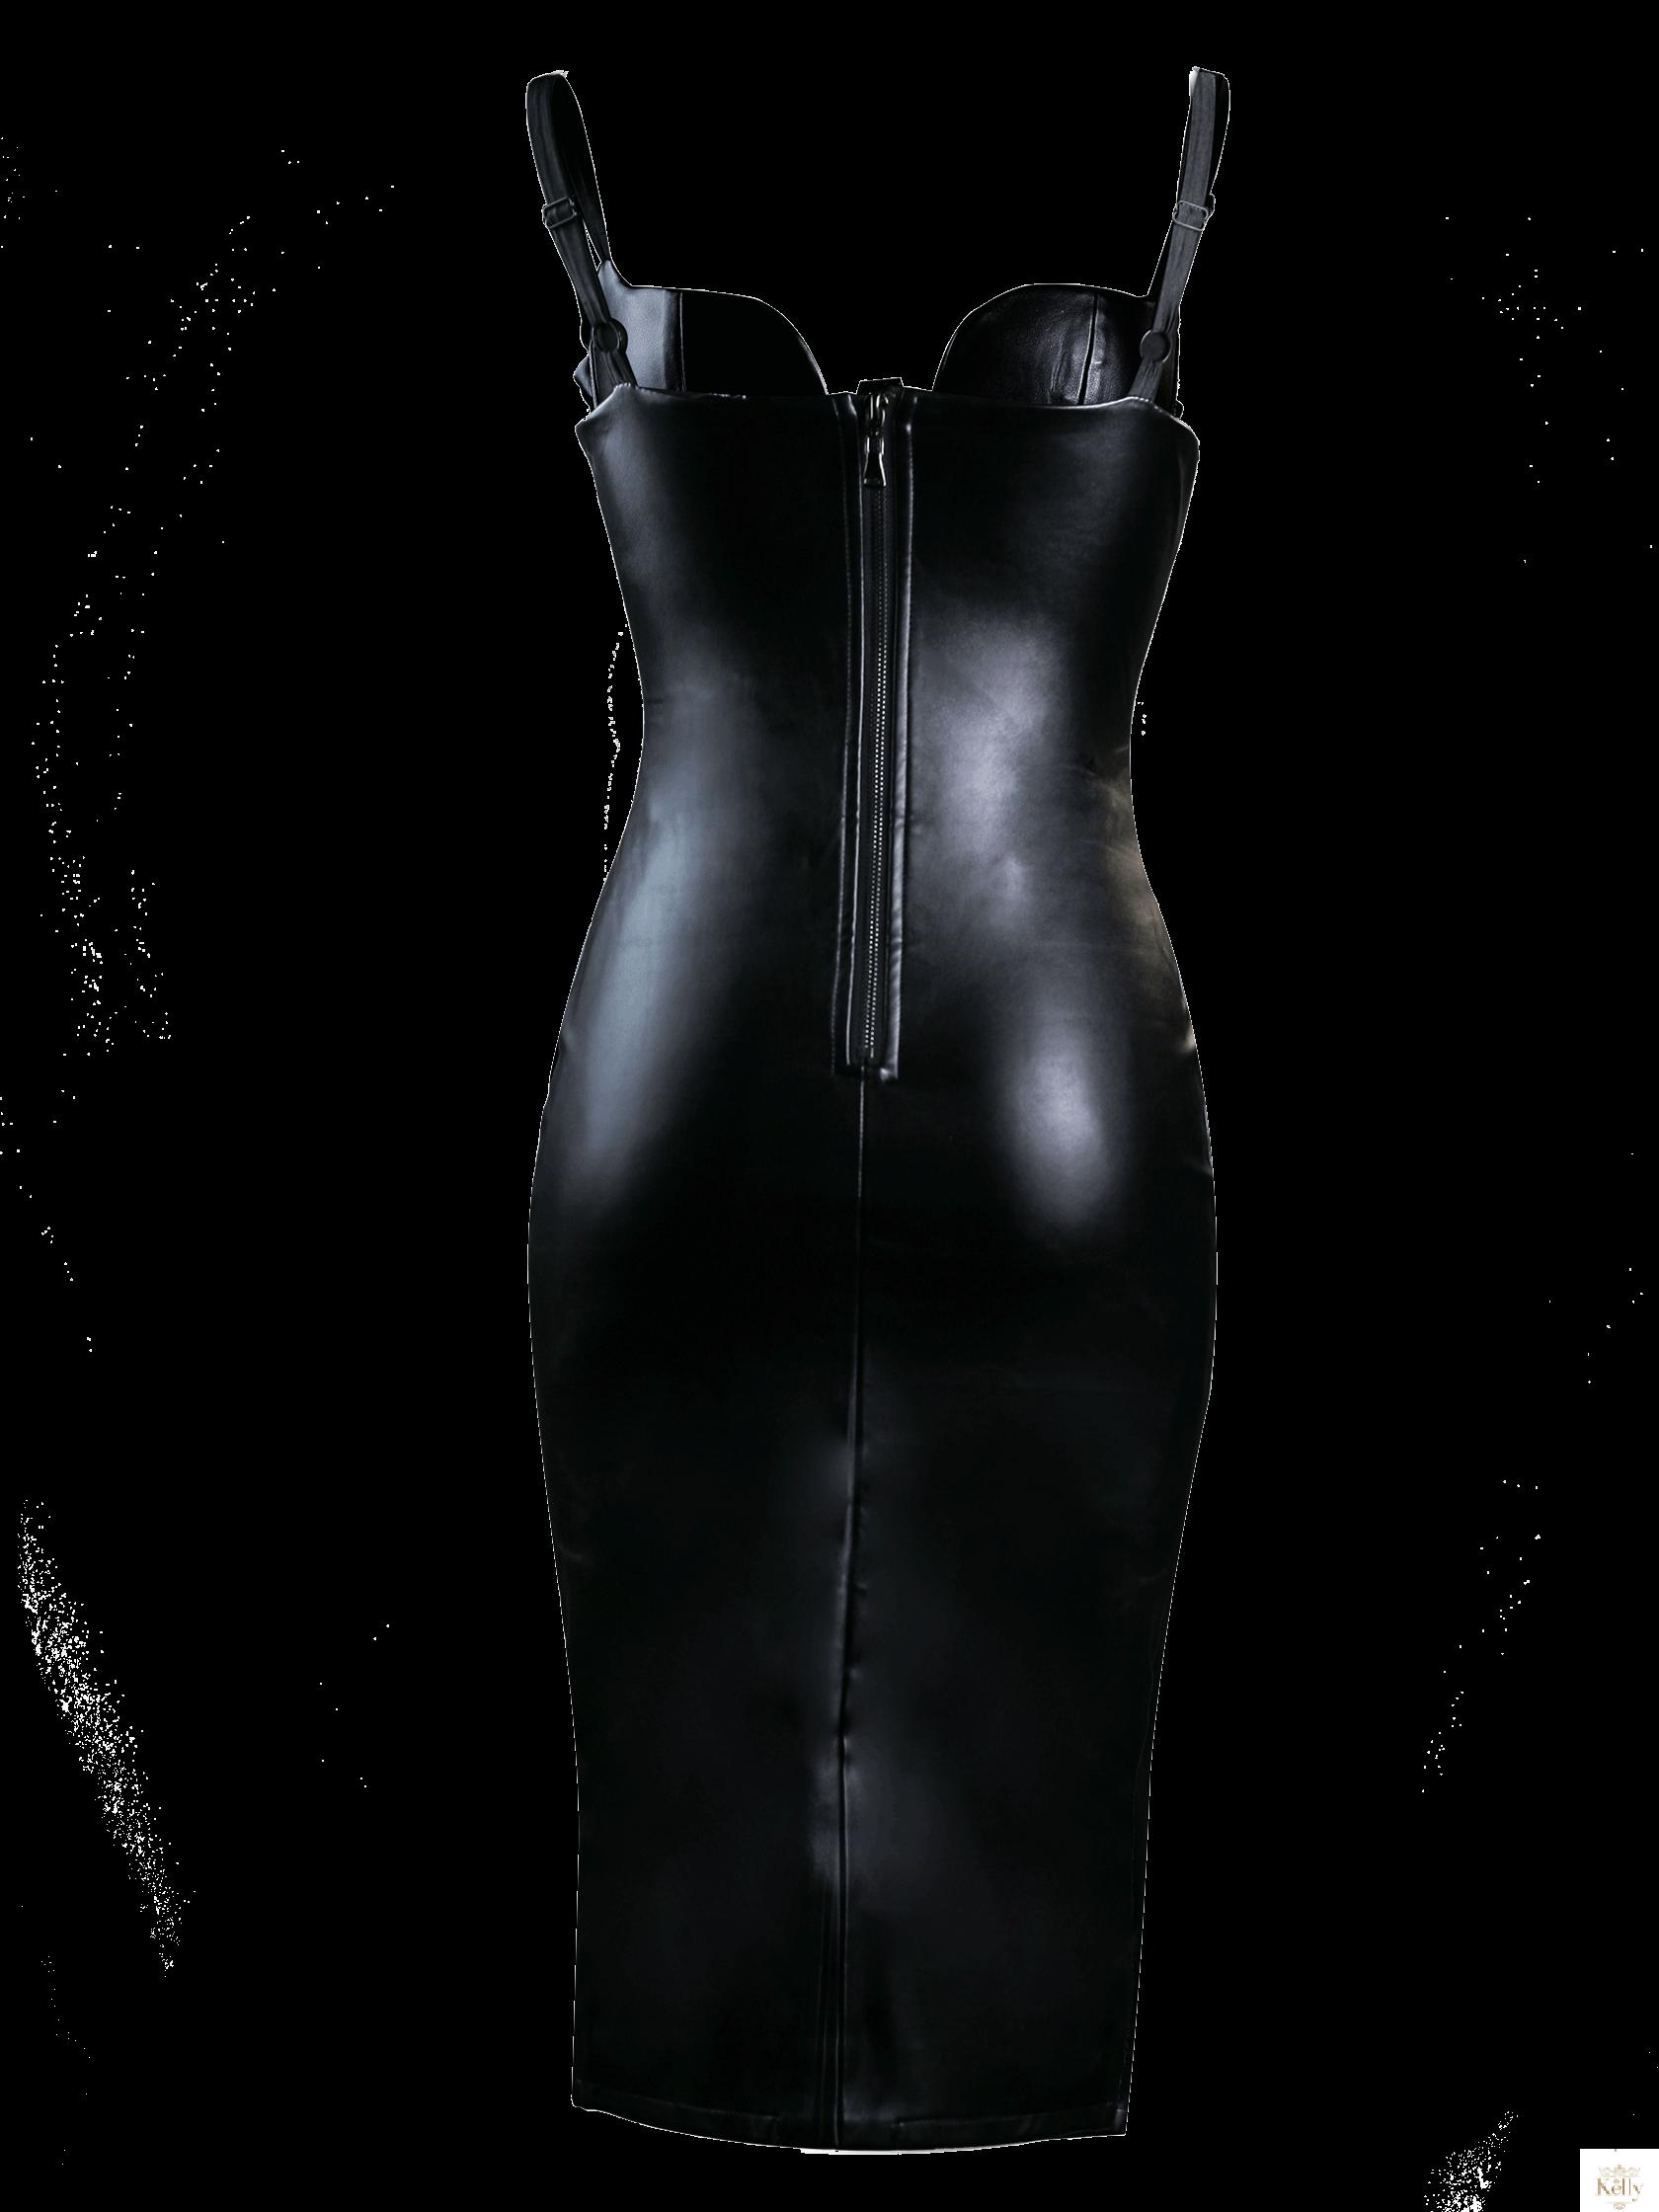 ed1620d2d2ab2a Sukienka czarna skórzana Felix | Sklep internetowy Kelly.com.pl